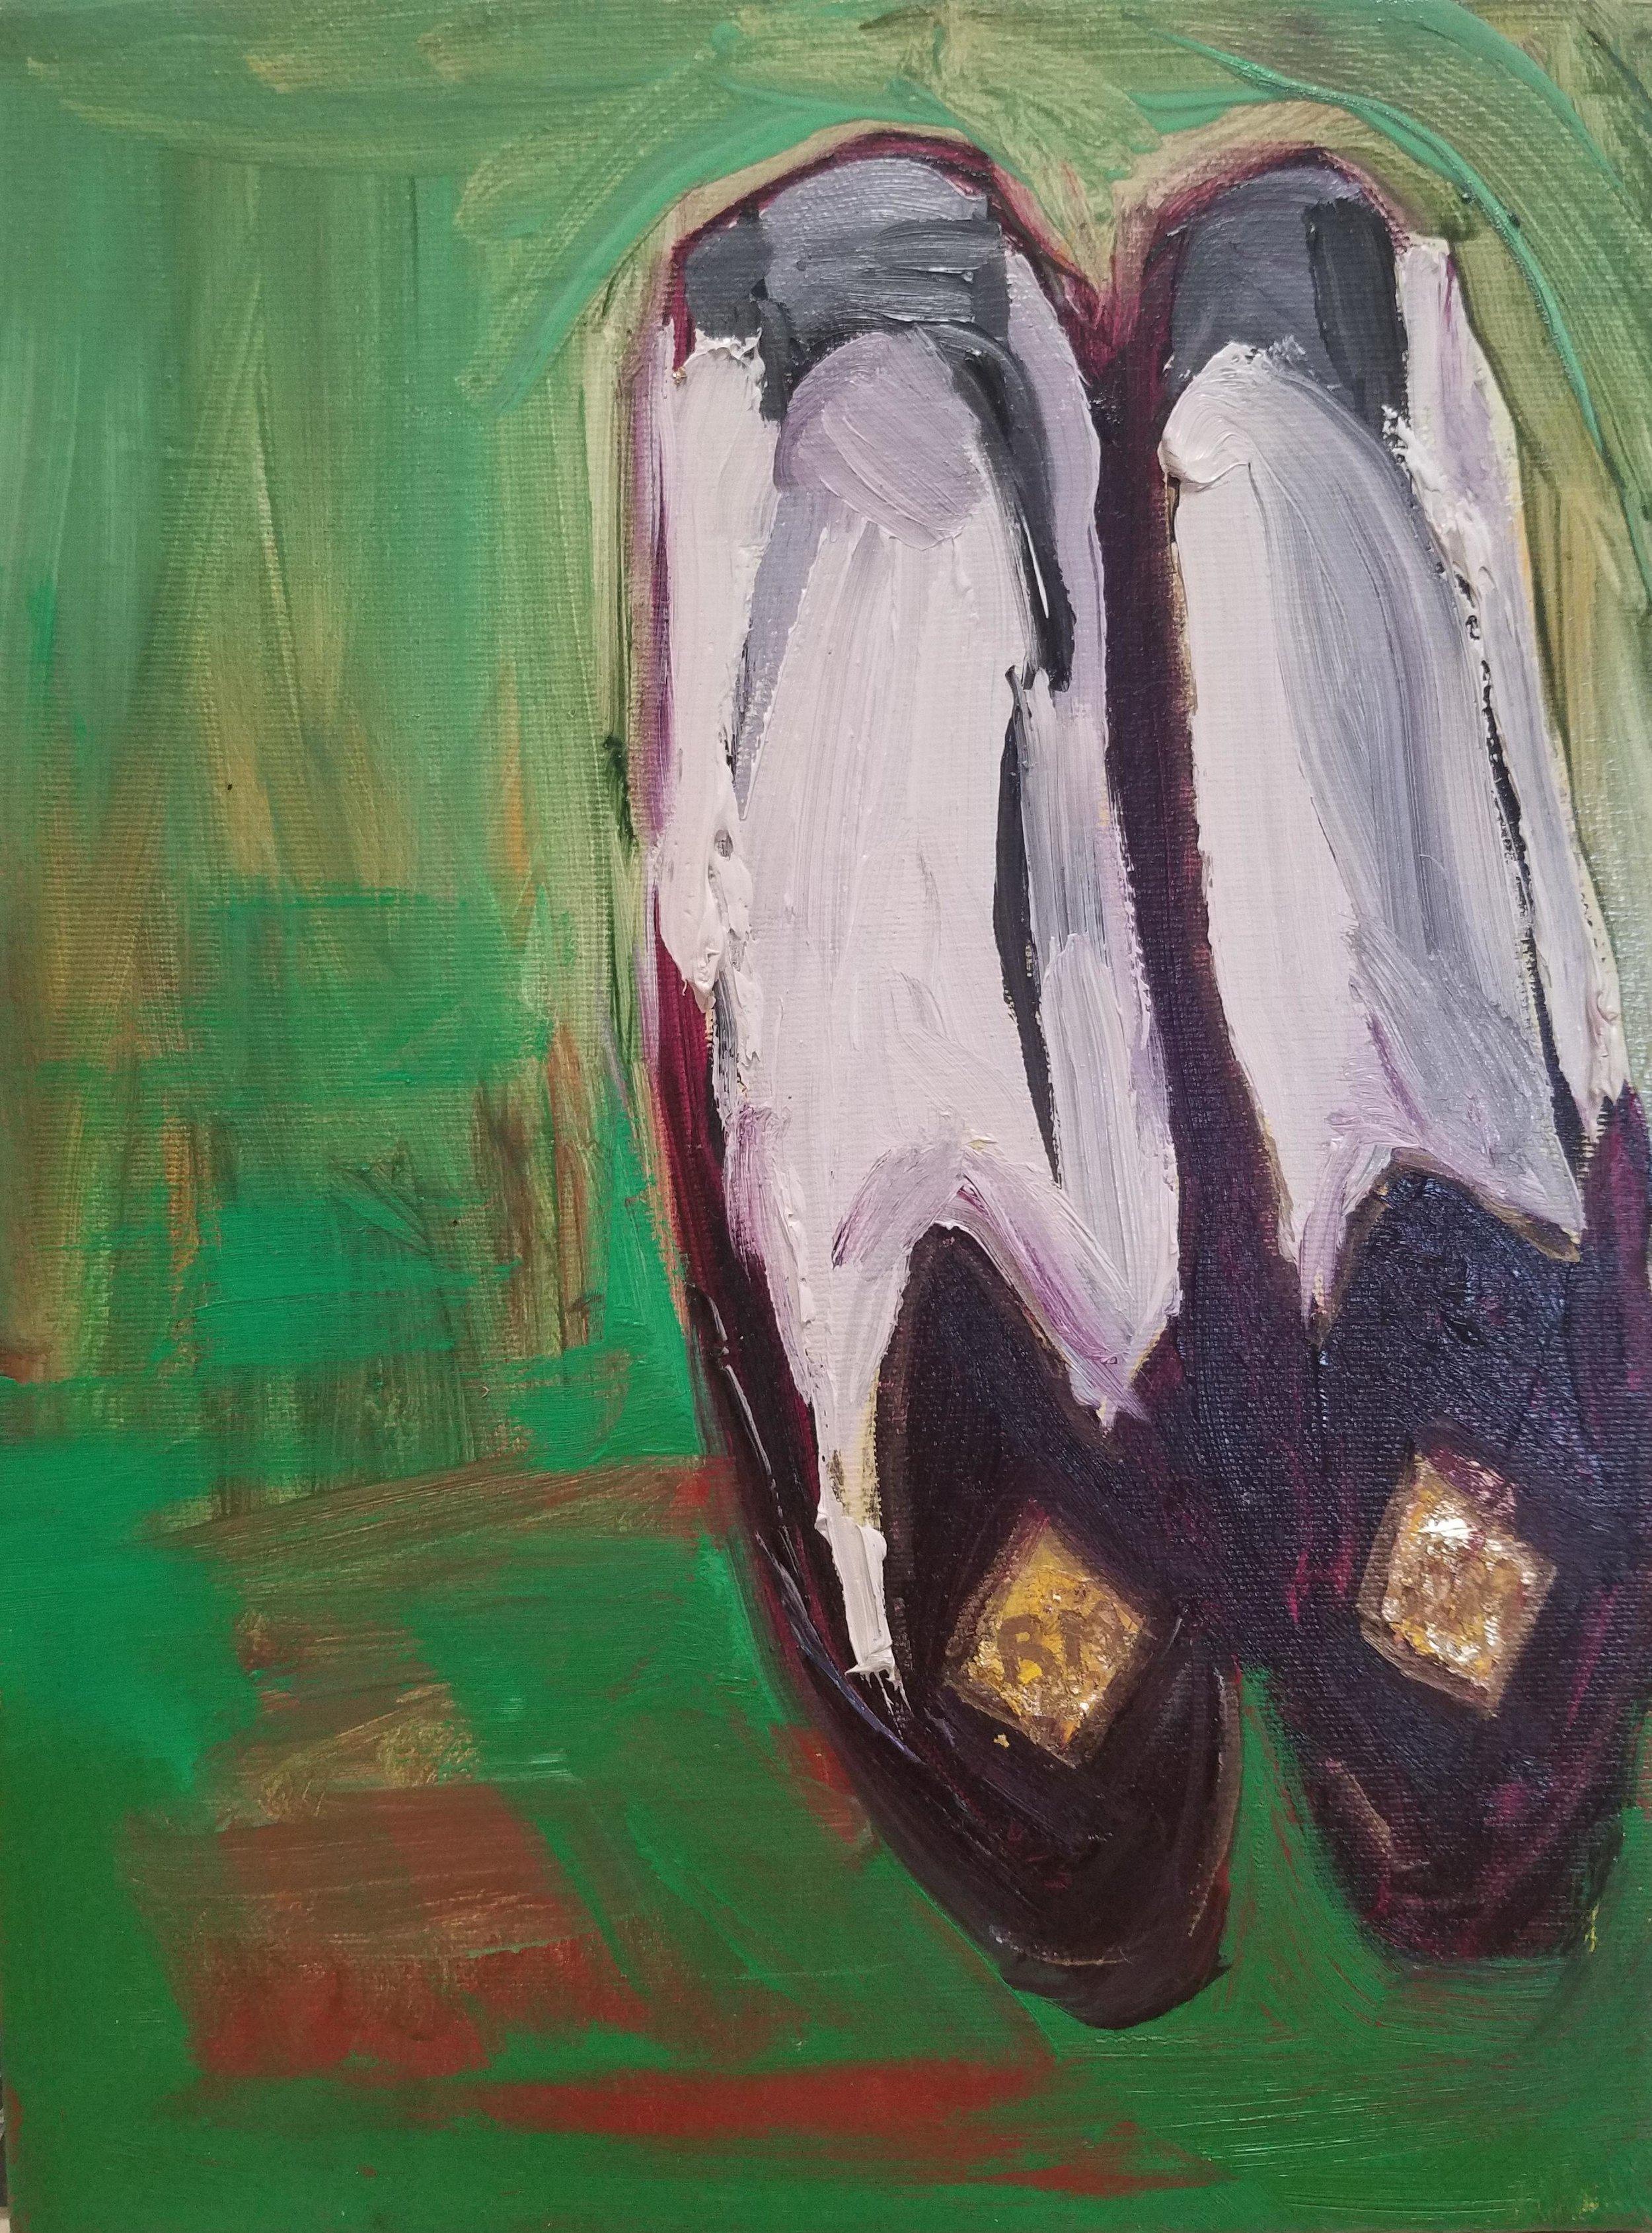 Patti Smith: Pantuflas Robert Mapplethorpe